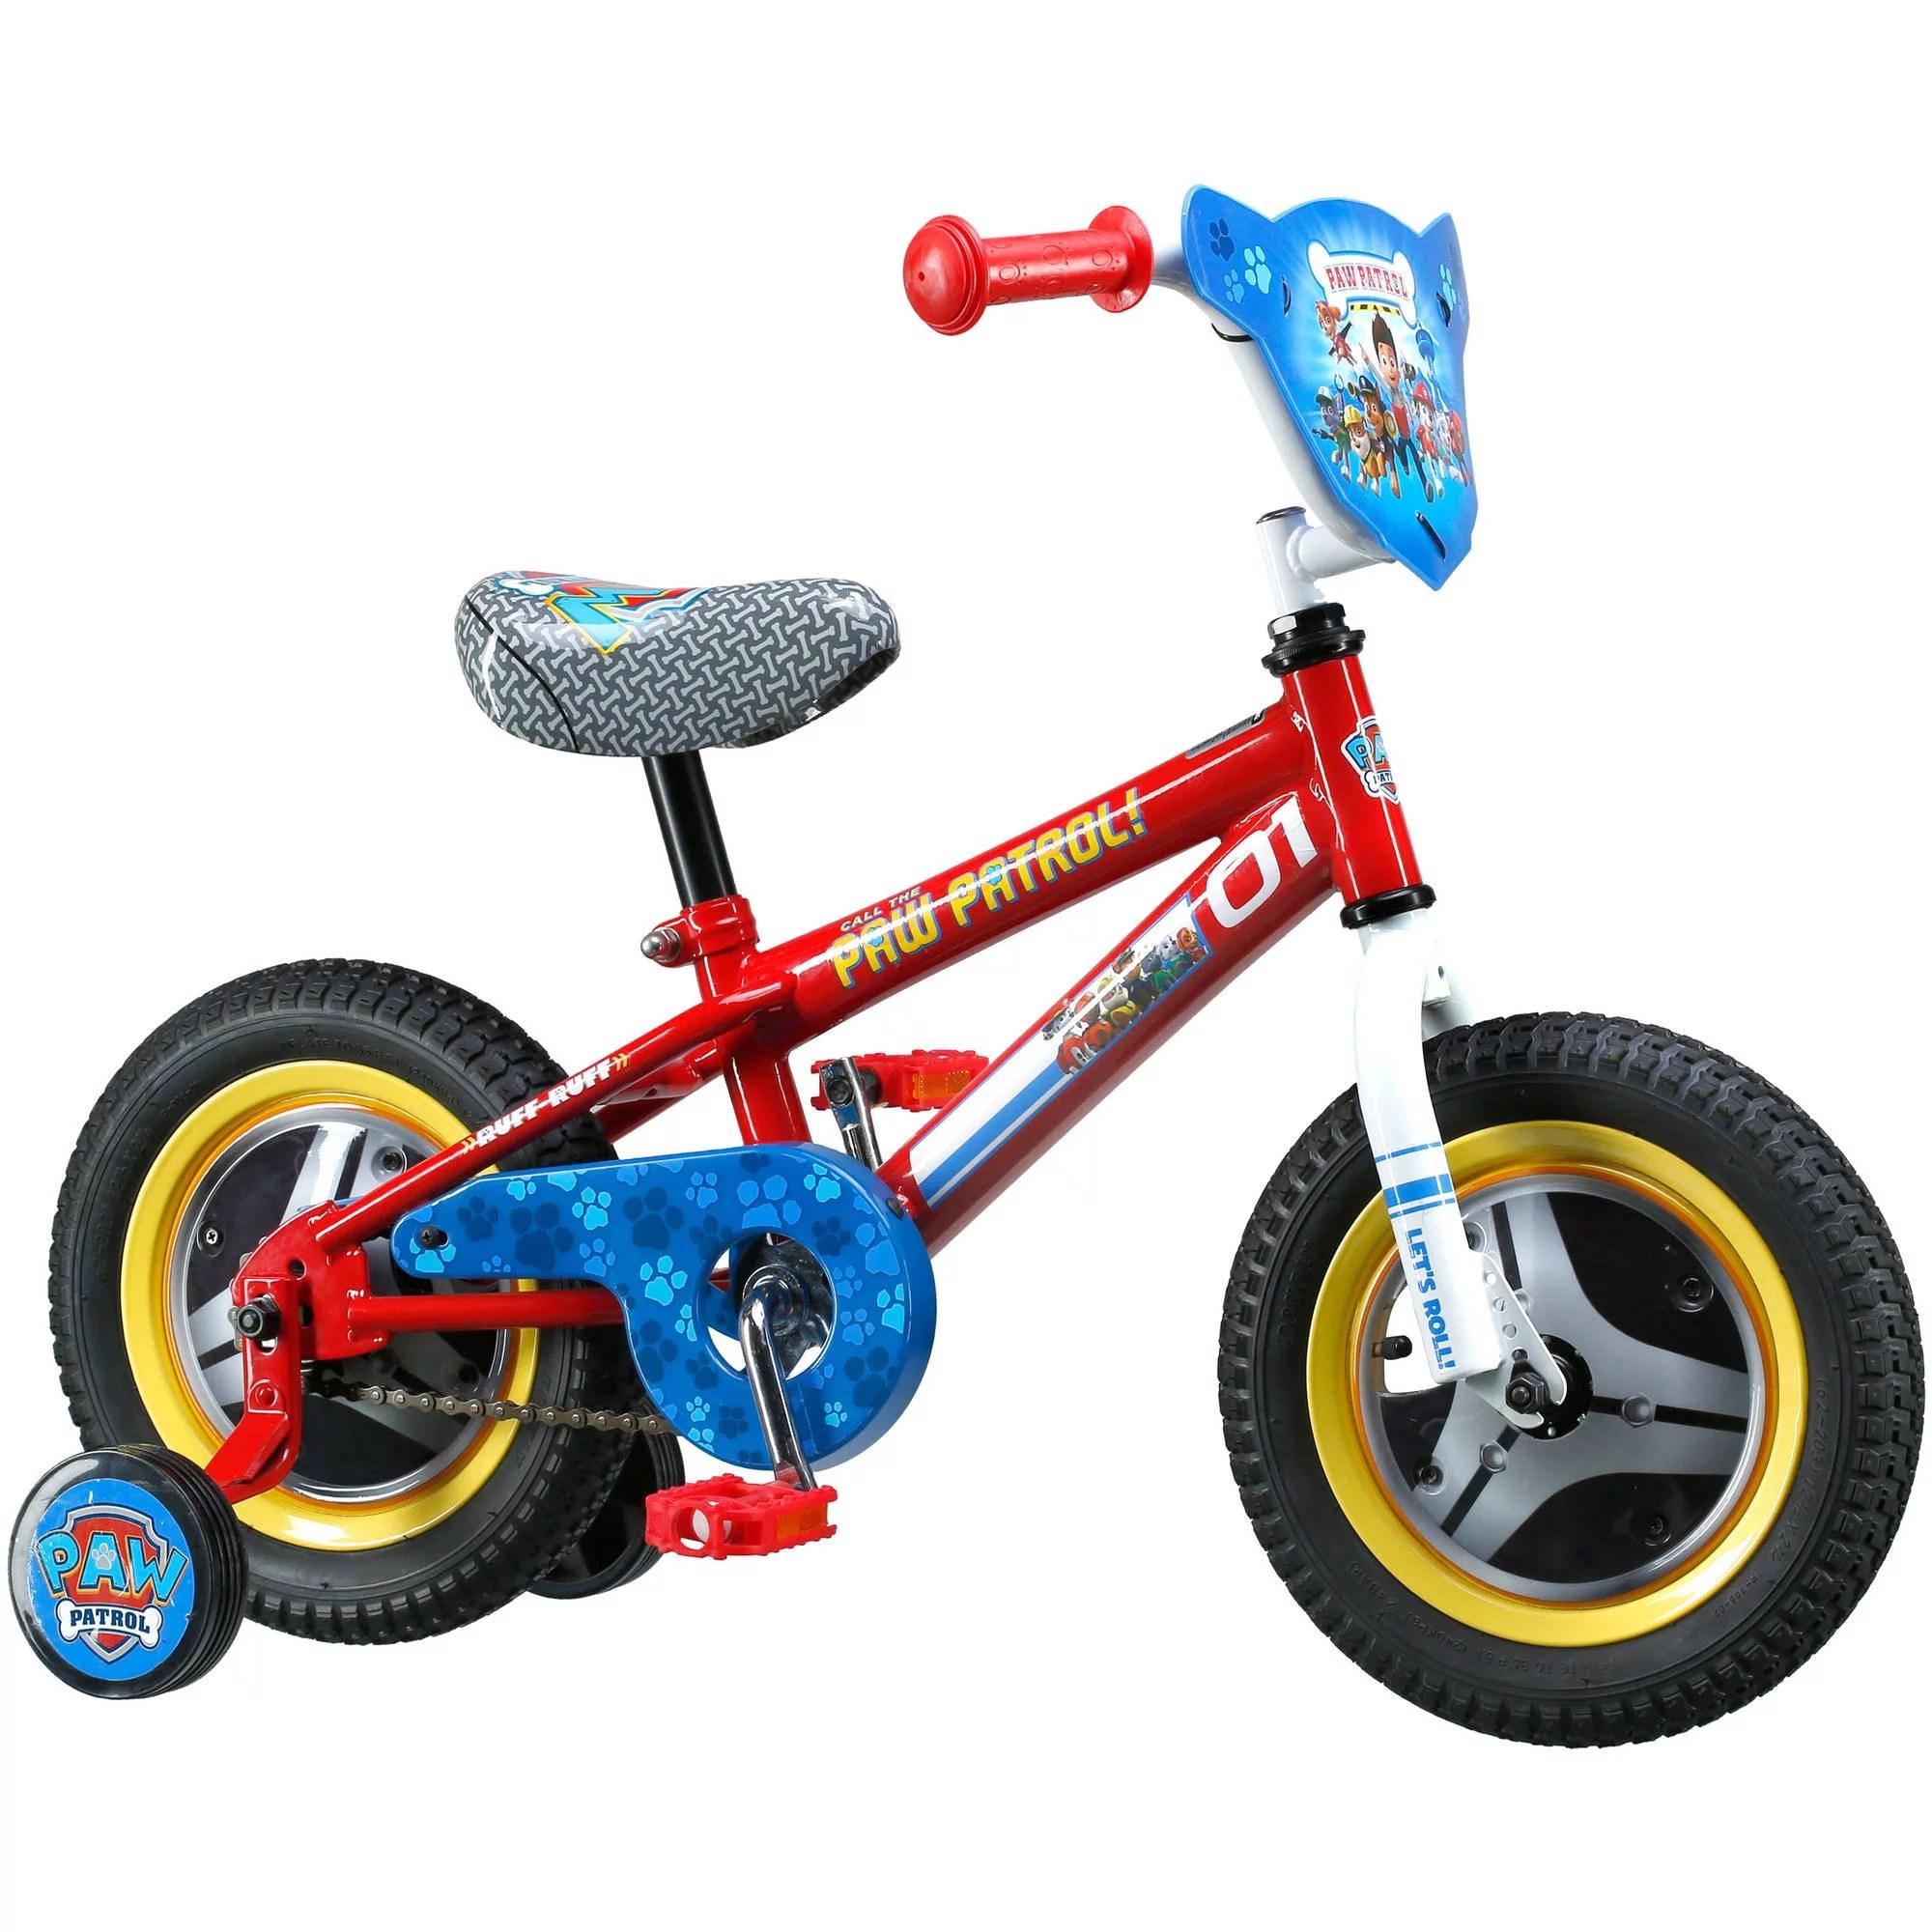 Paw Patrol Kids Small Bike Girls Boys Toddler Bicycle W